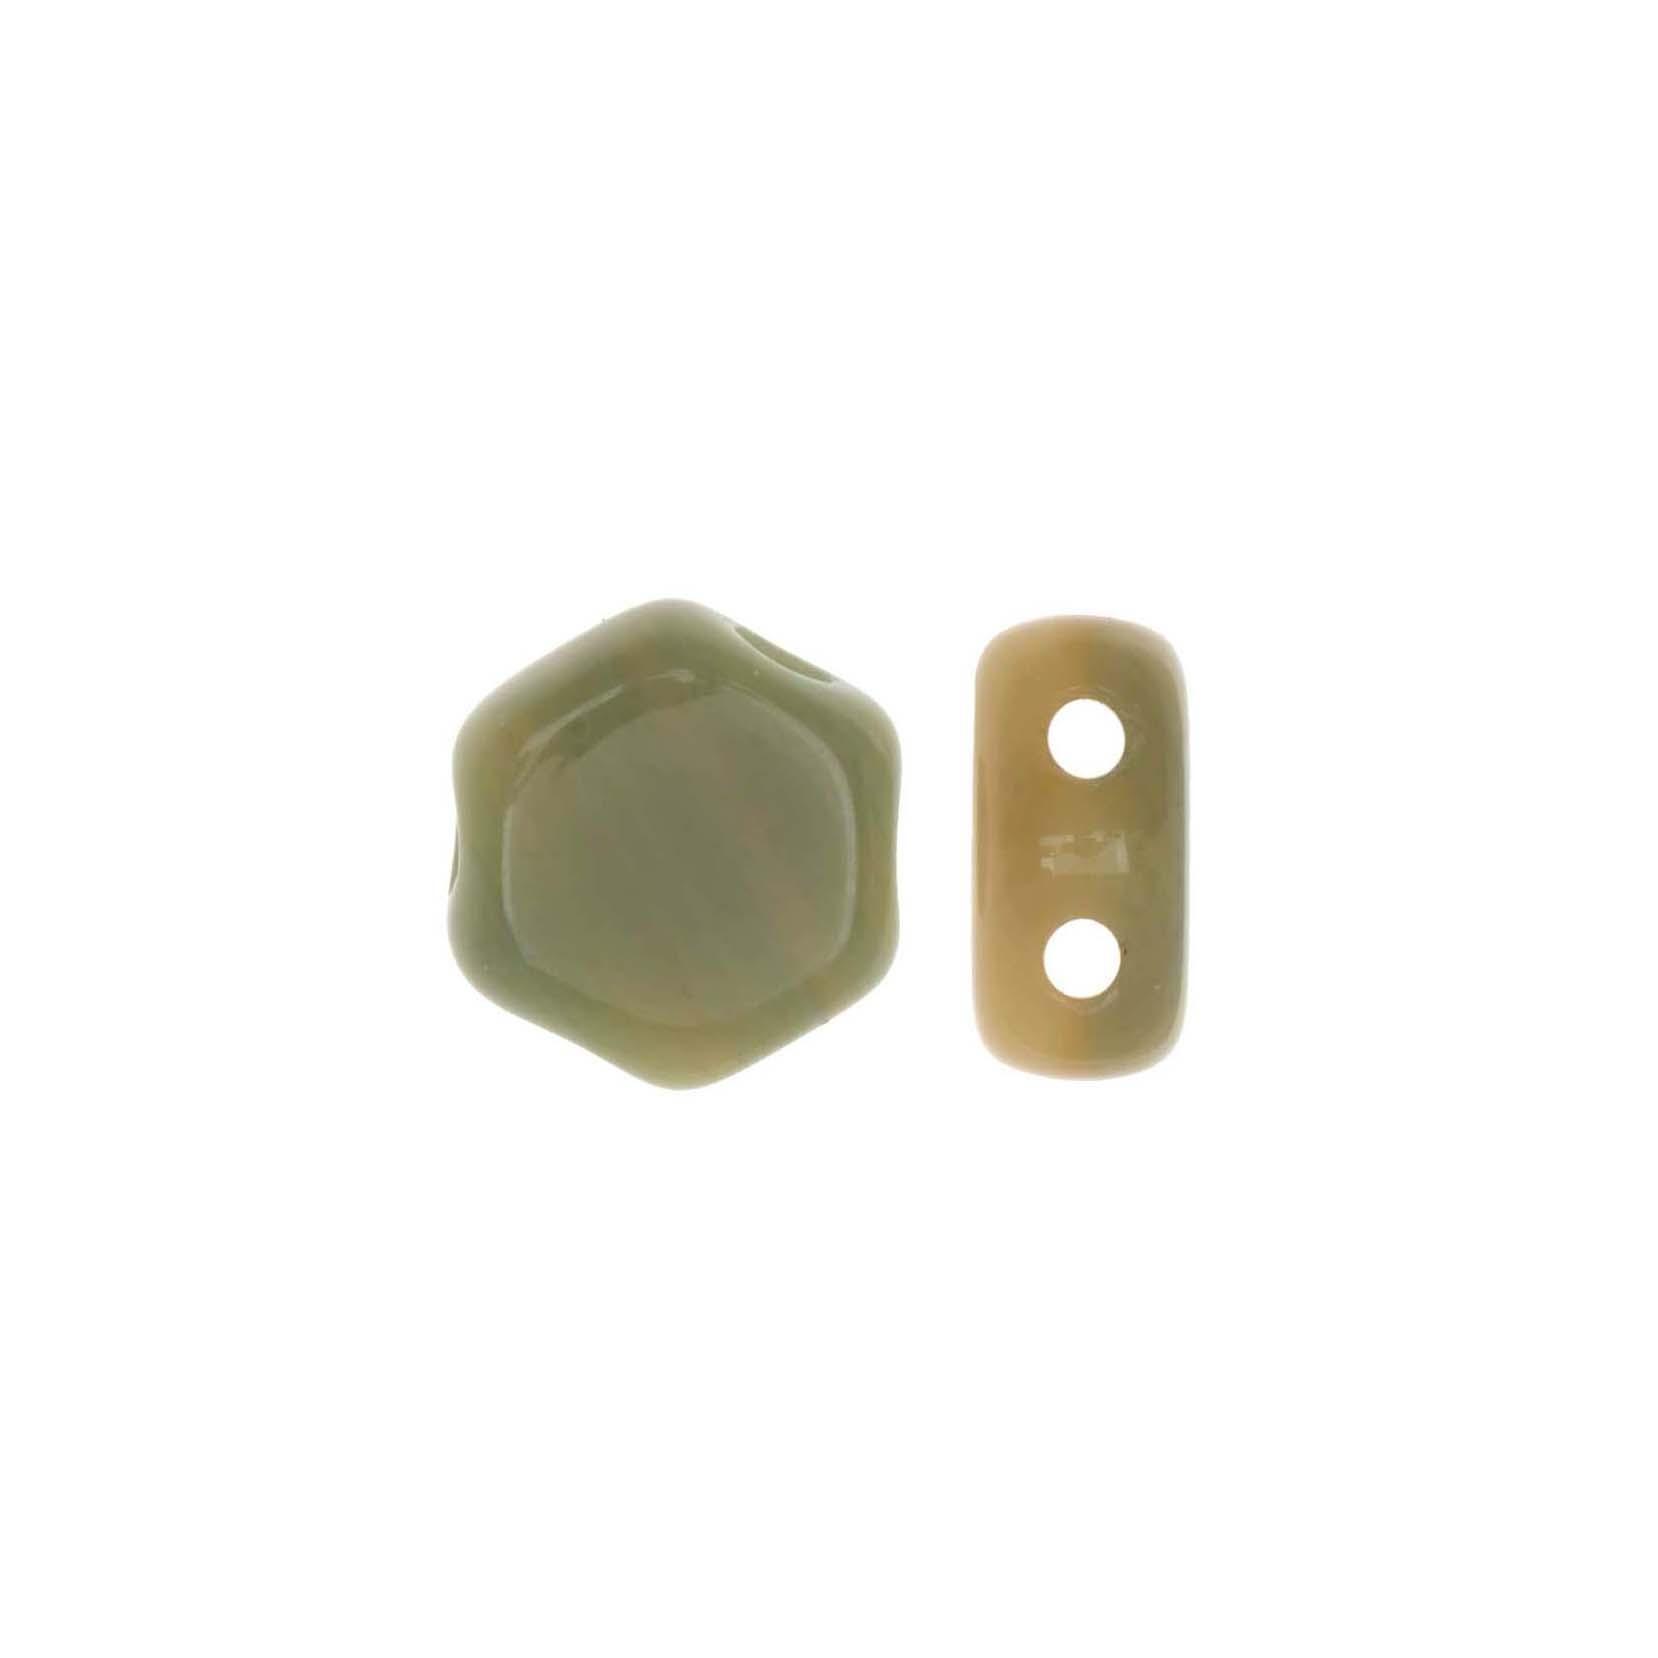 Final Sale - Czech Glass Honeycomb Beads, 2-Hole Hexagon 6mm, 30 Pieces, Hodge Podge Seafoam